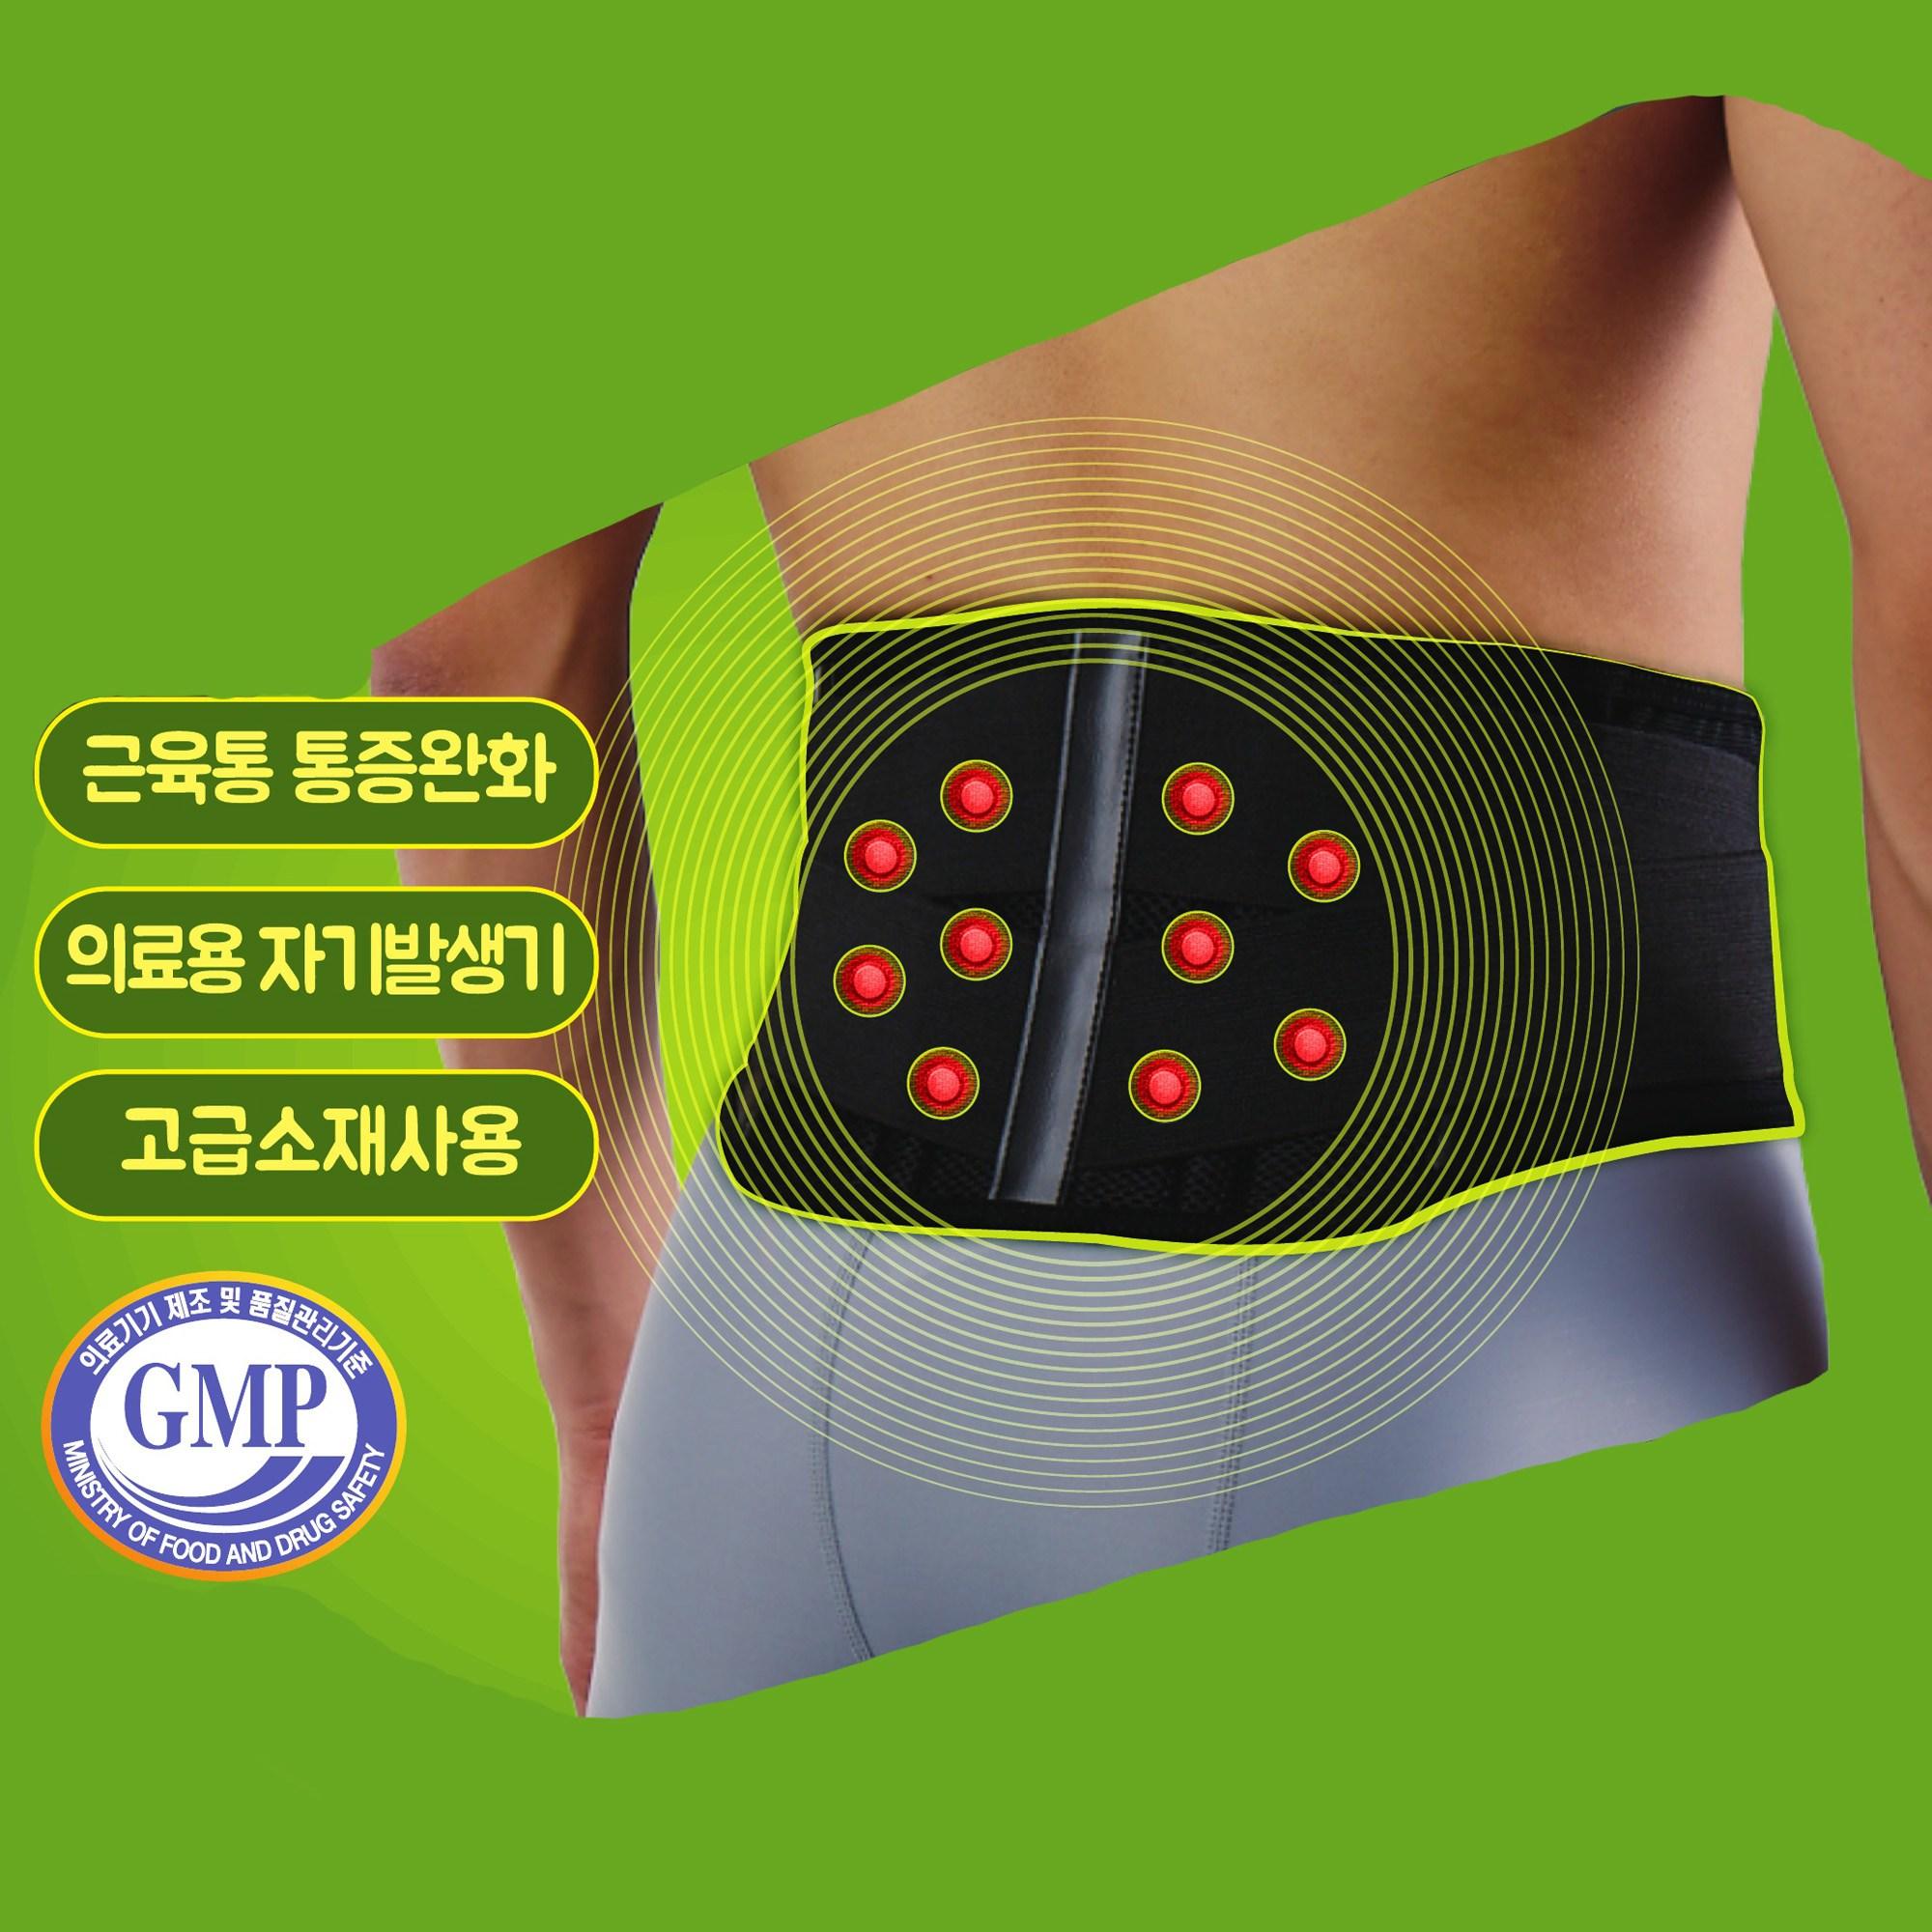 SM Oracare 국내산 의료용 허리보호대, 1개